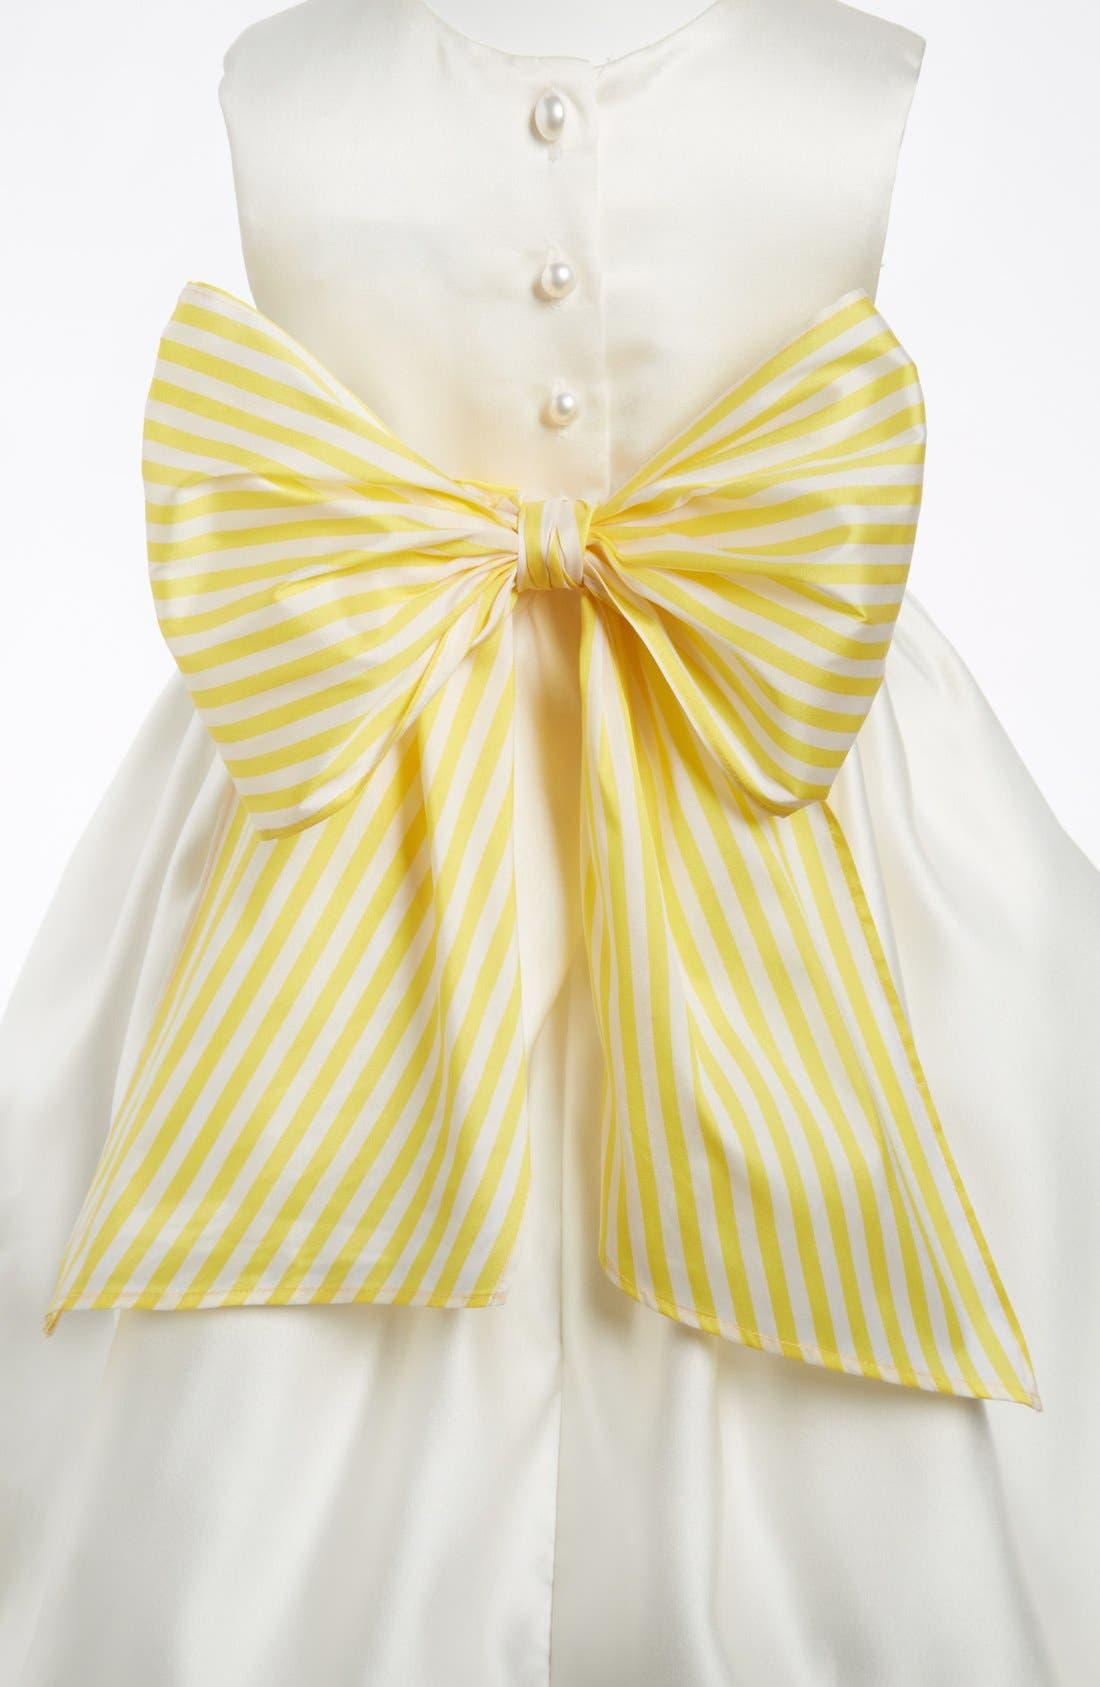 Stripe Sash,                             Main thumbnail 1, color,                             YELLOW STRIPE